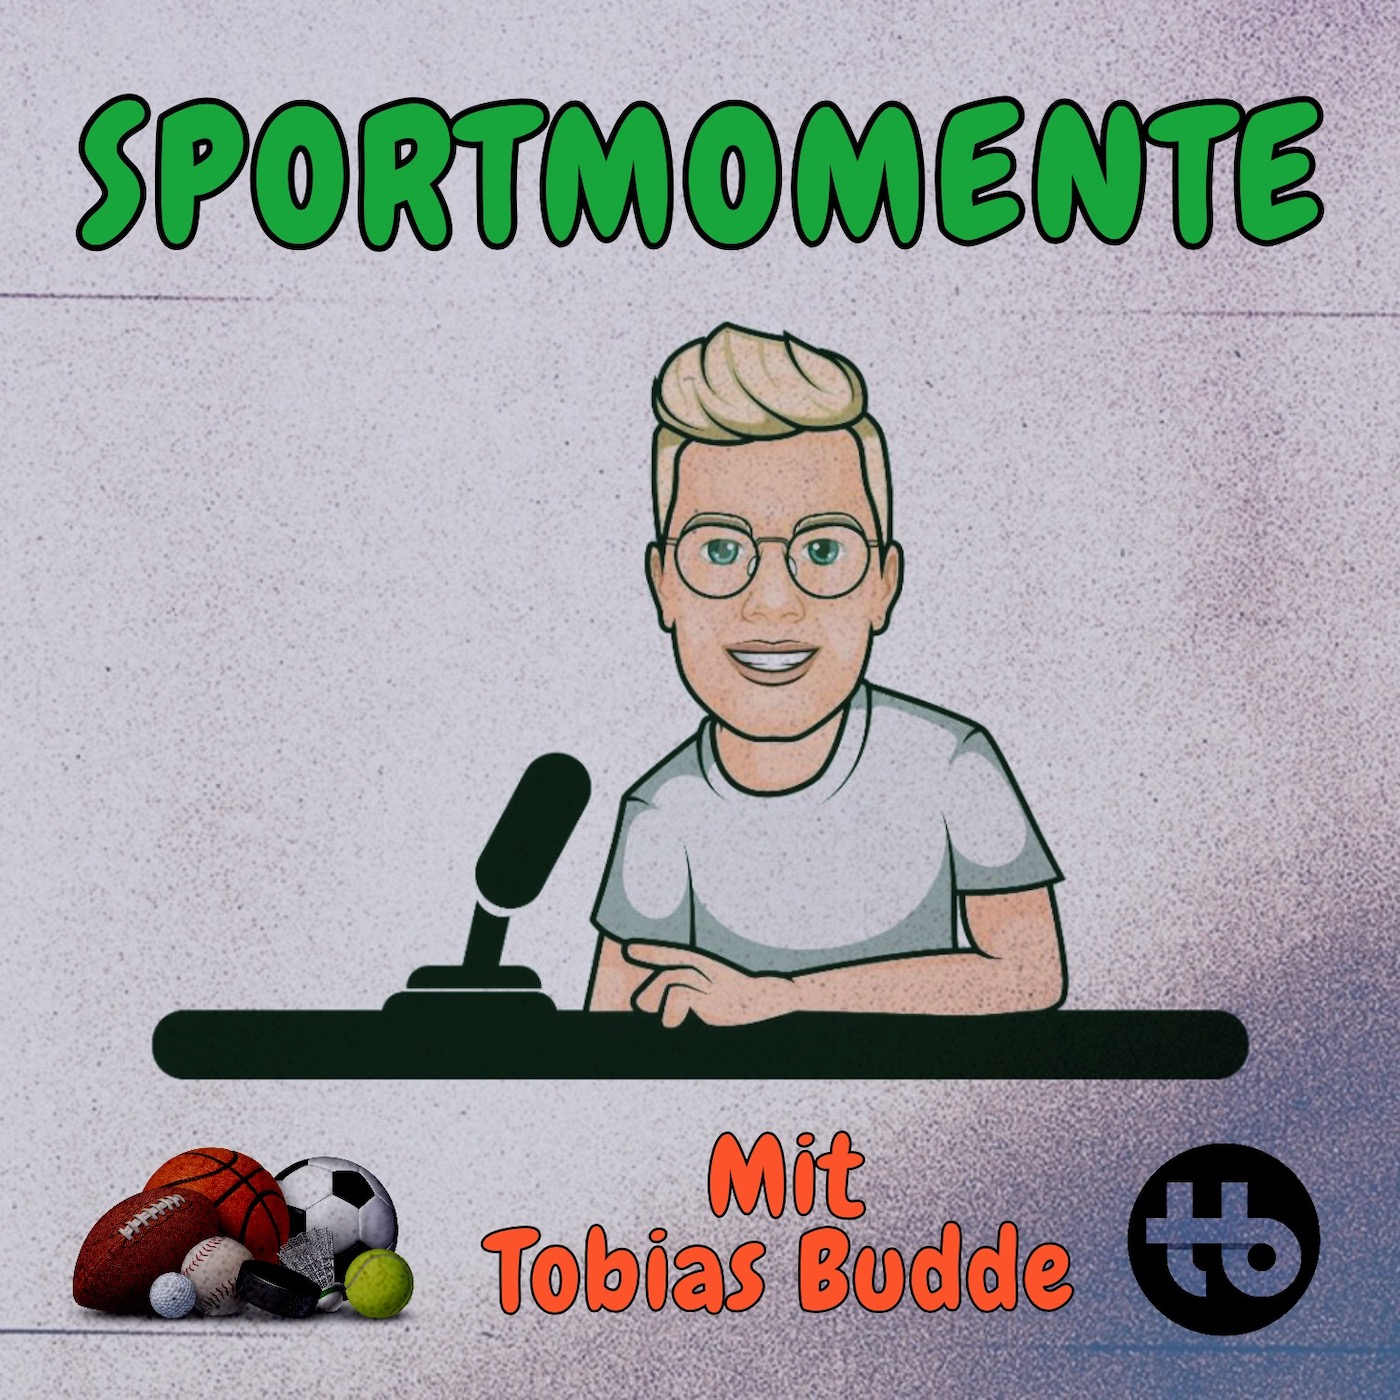 SPORTMOMENTE - Tobias Budde Podcast (Konzeption & Produktion)